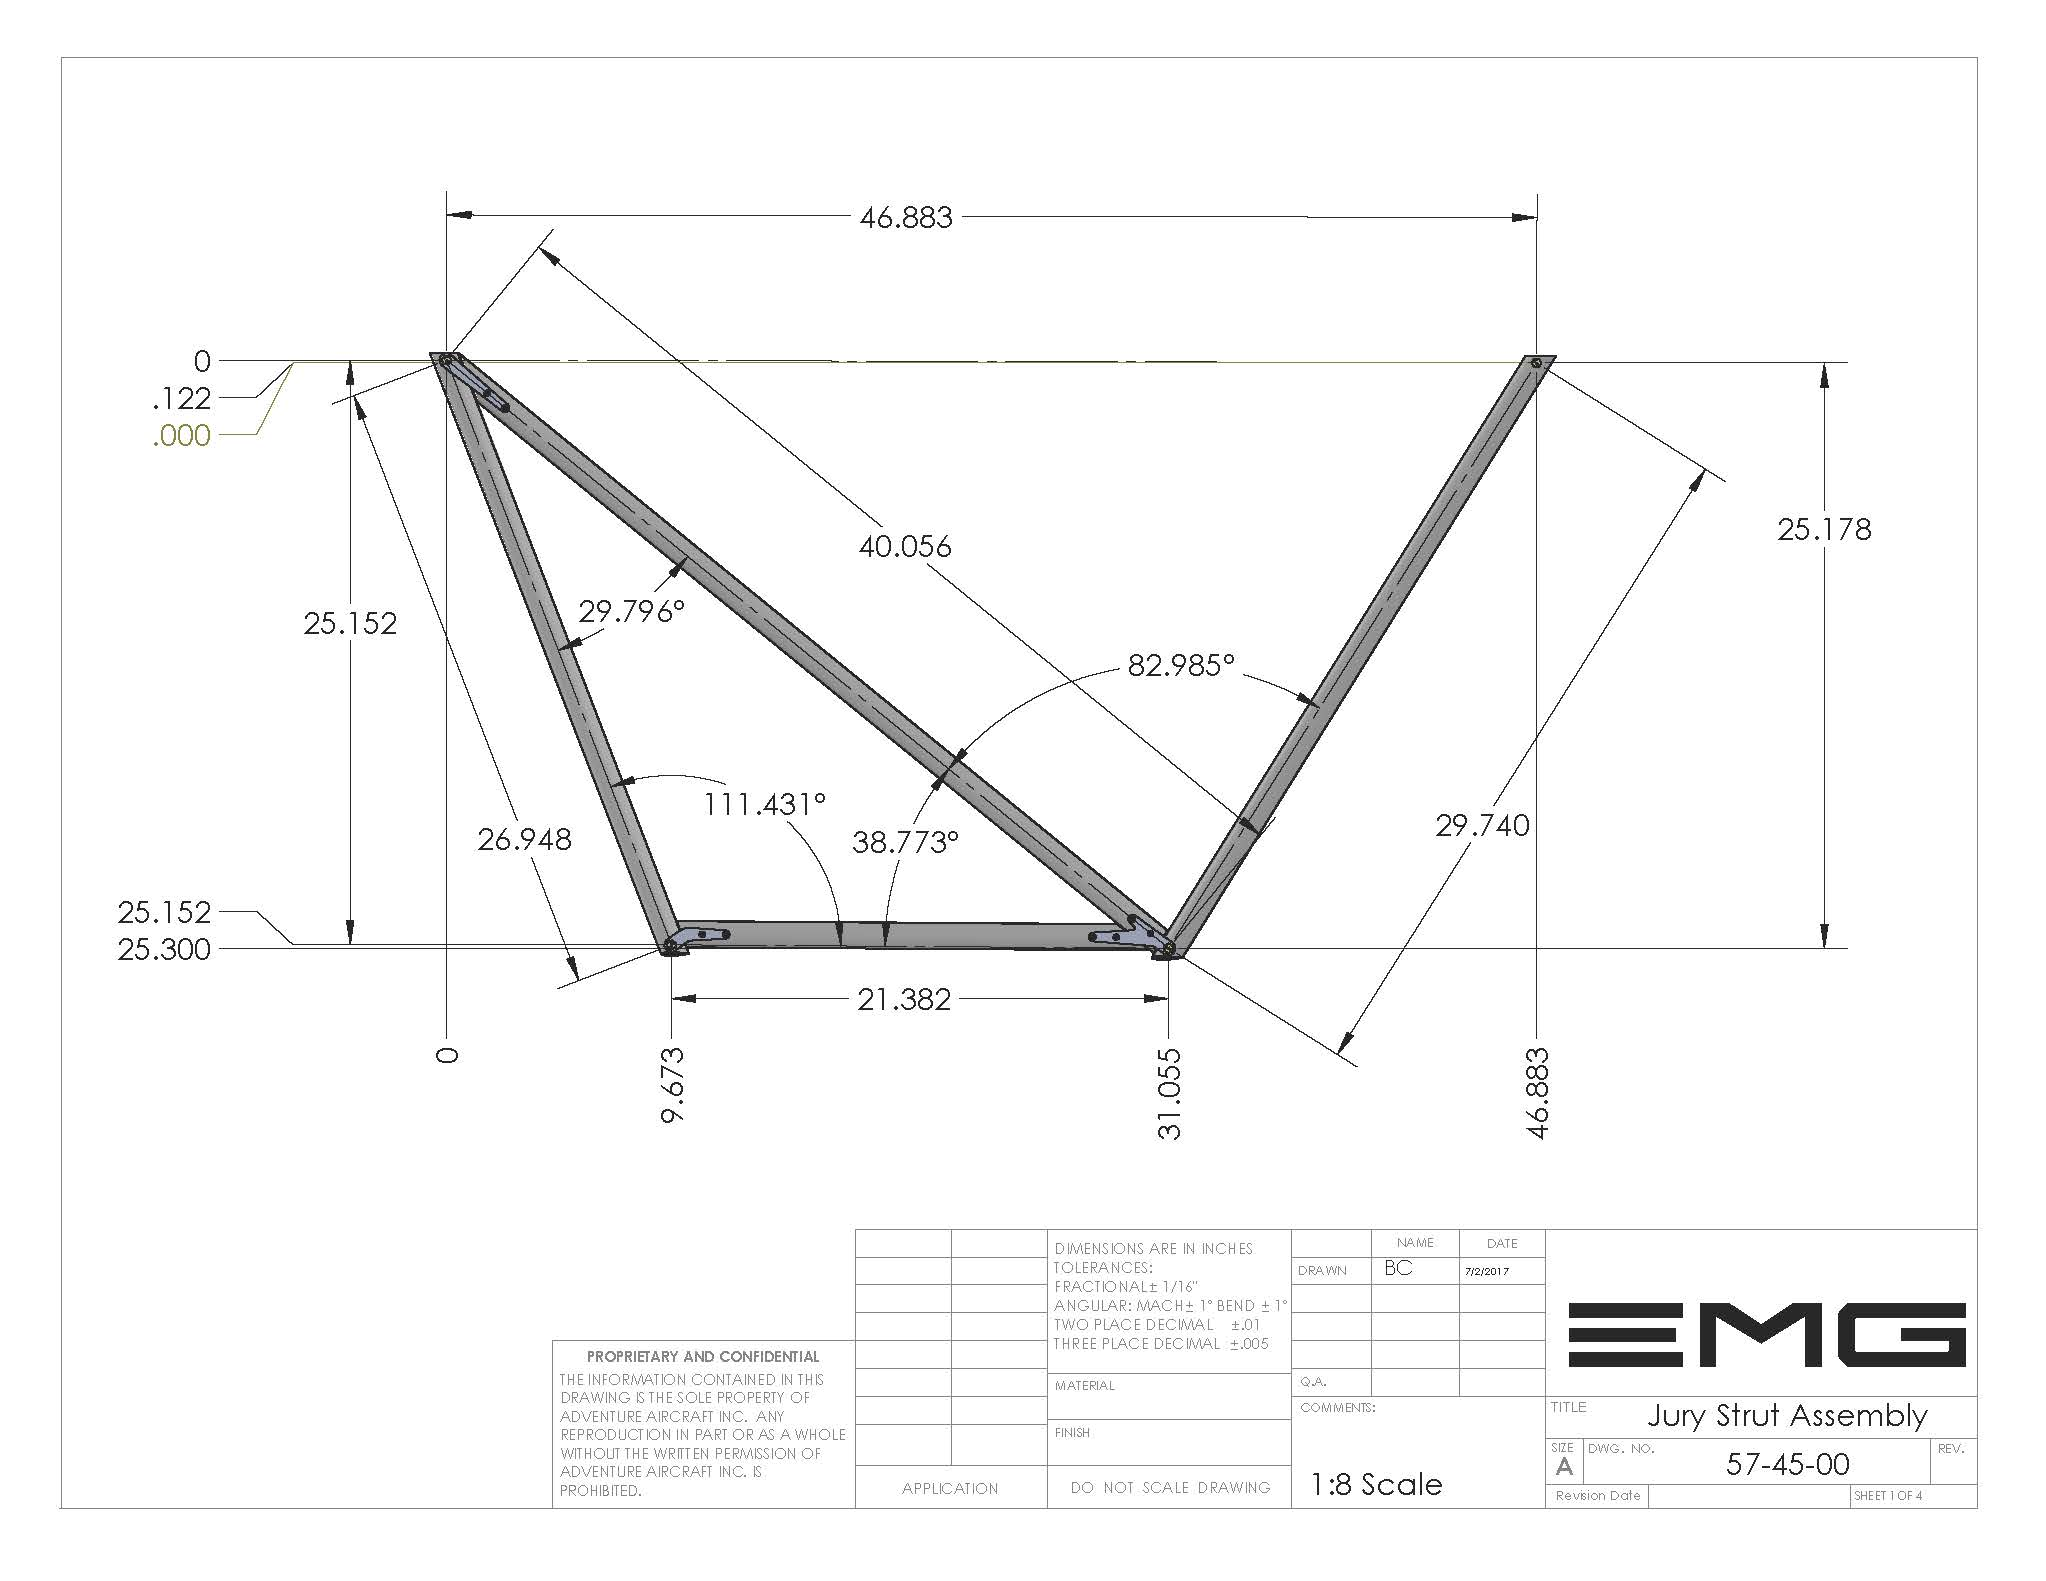 EMG-6 Home of the EMG-6 Electric Motor Glider jury strut